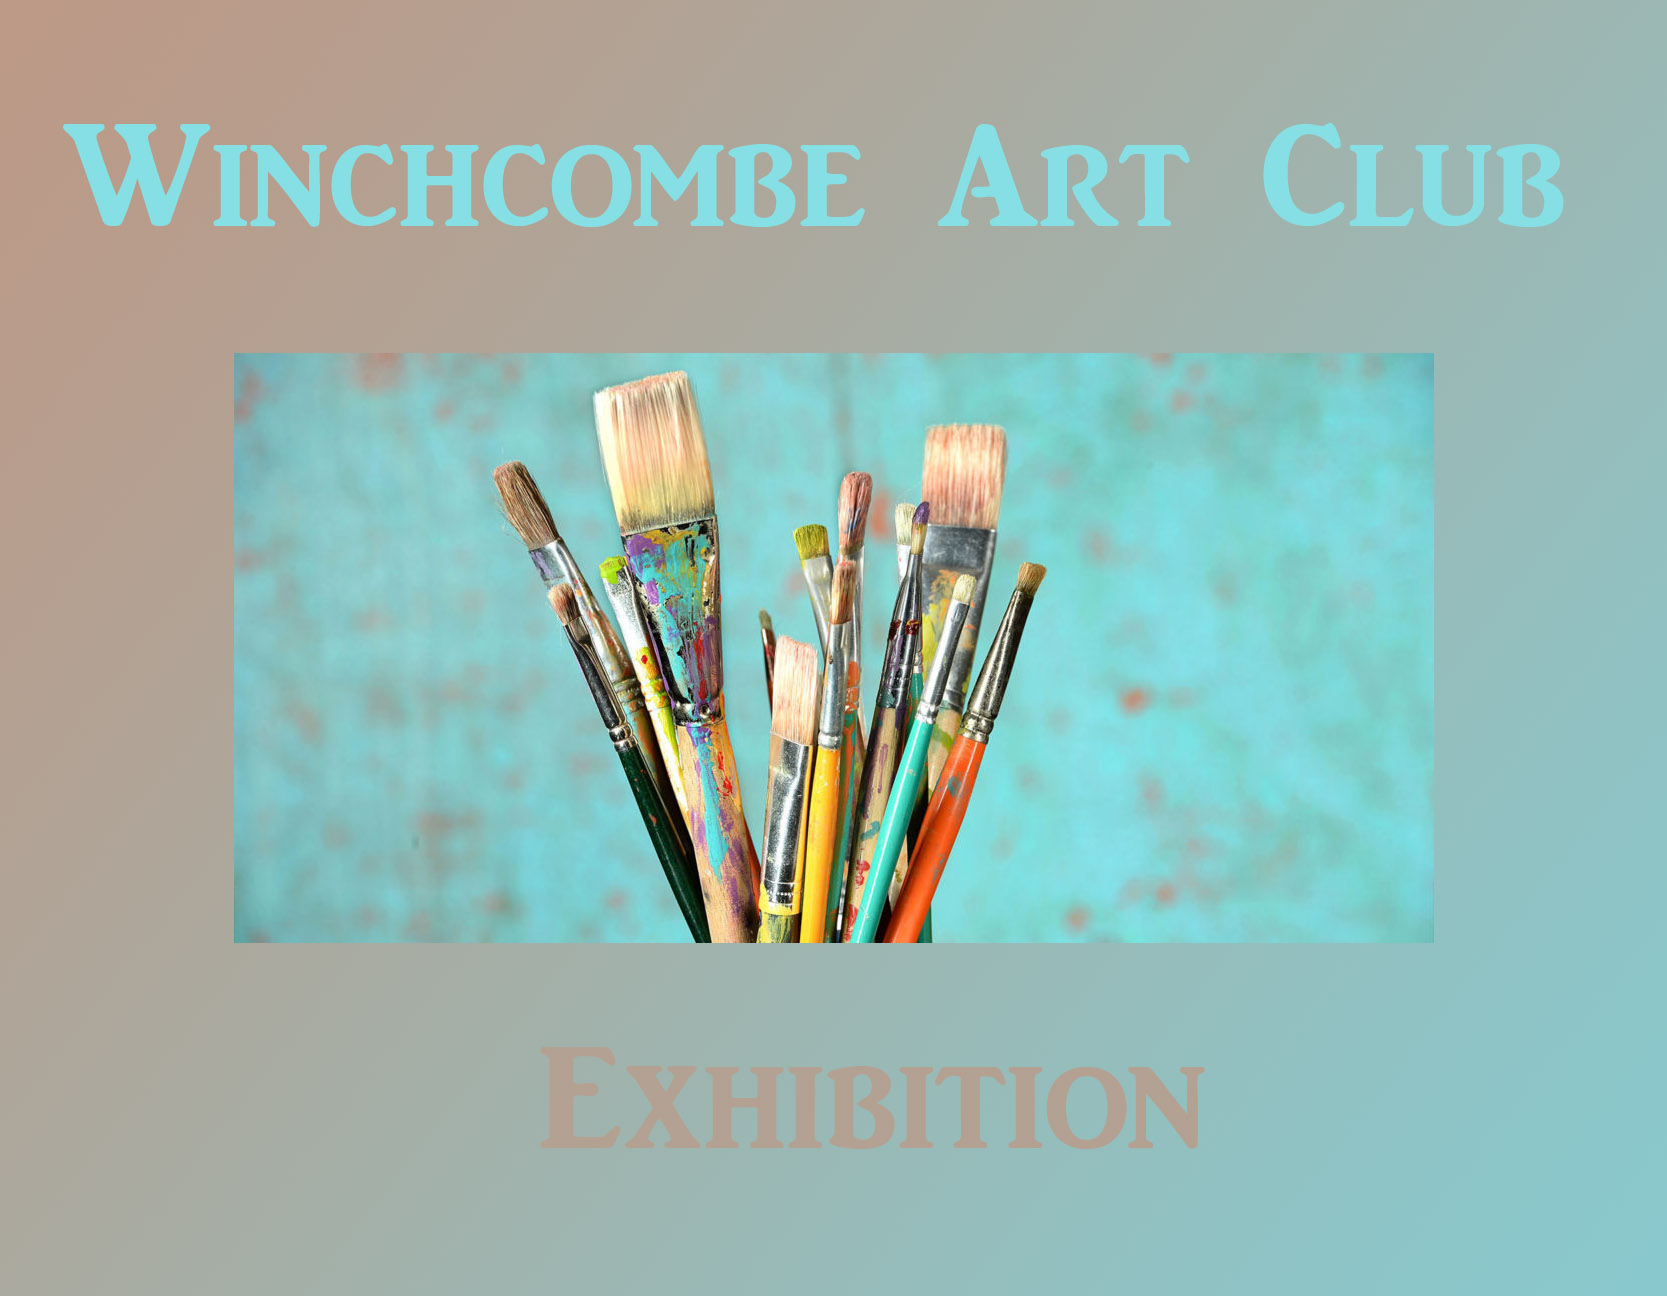 Winchcombe Art Club